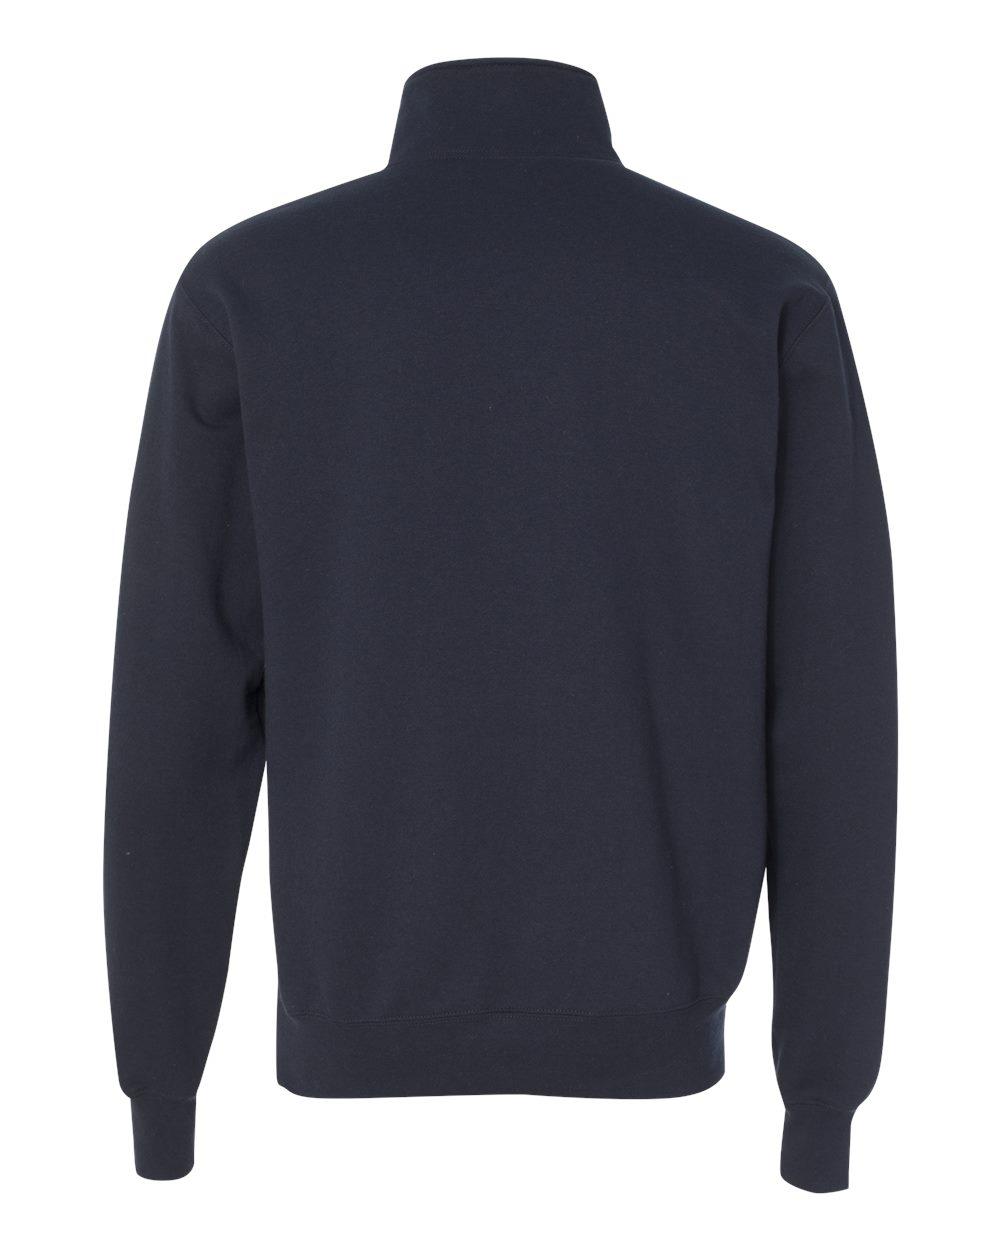 Champion-Mens-Double-Dry-Eco-Quarter-Zip-Pullover-Sweatshirt-S400-up-to-3XL miniature 13